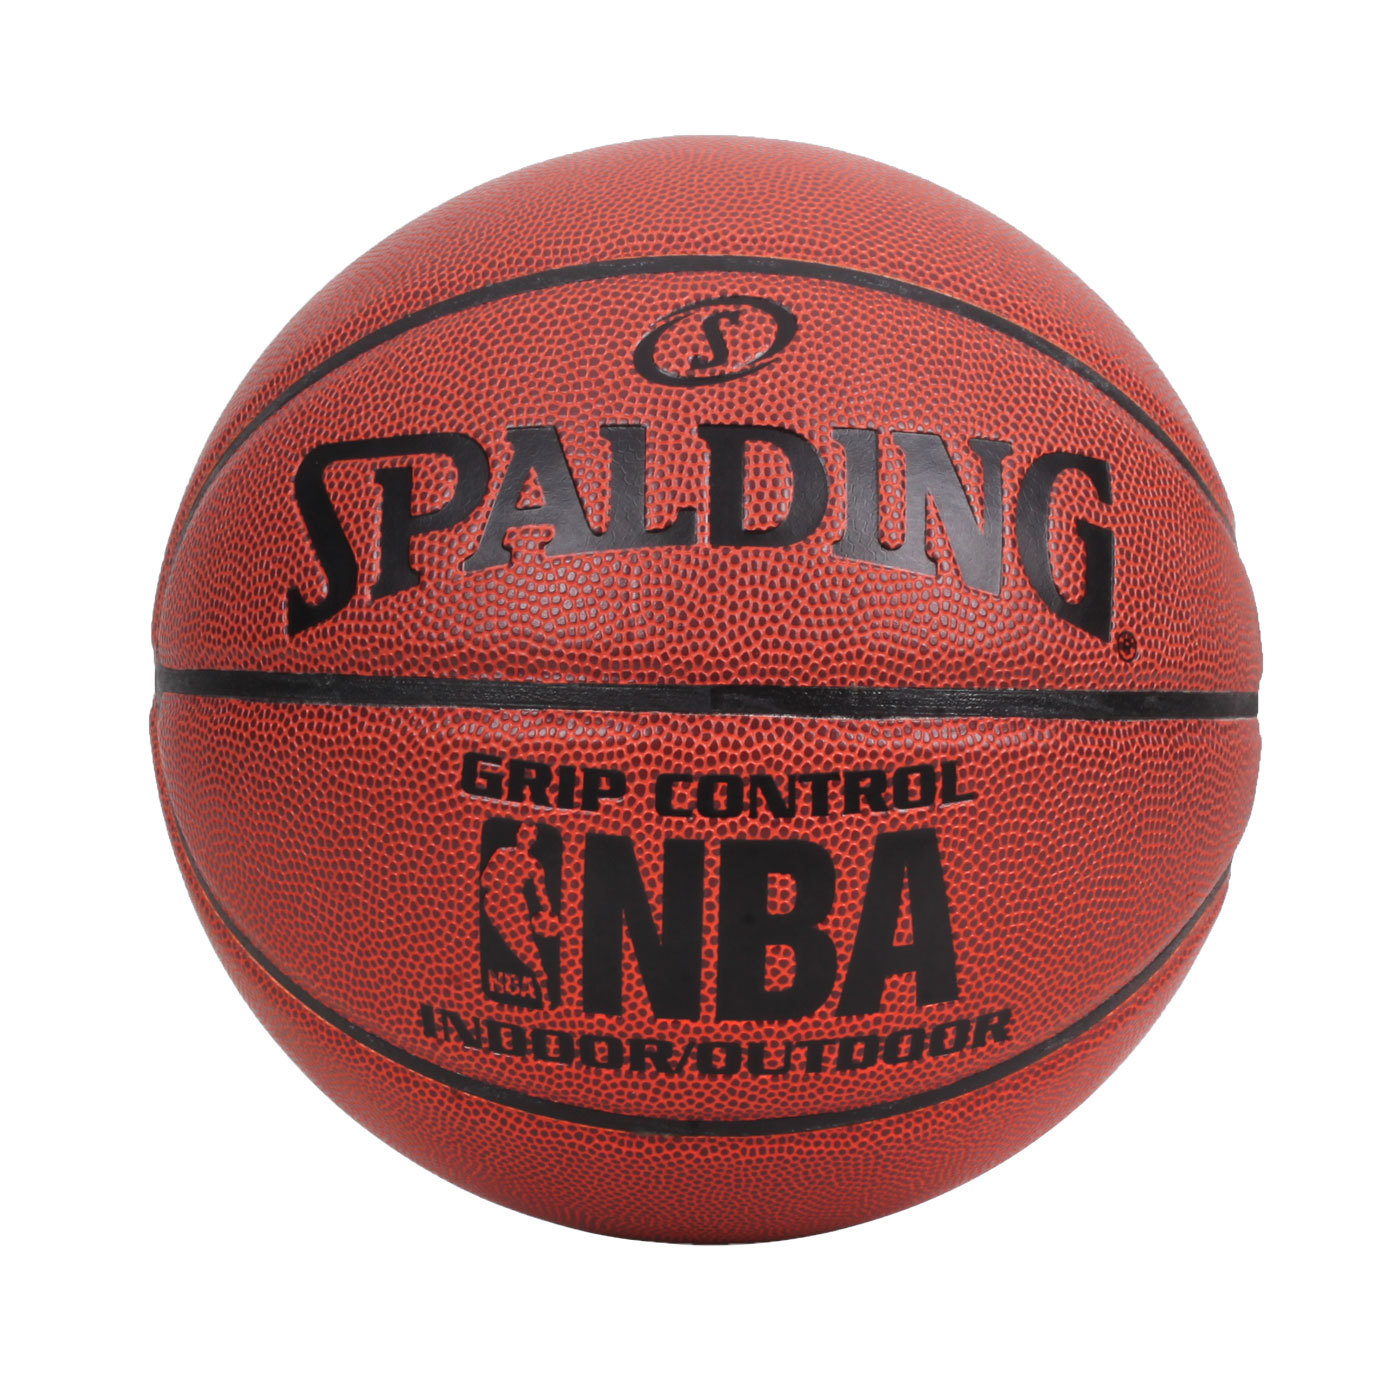 SPALDING NBA Grip Control PU籃球 #7 SPA74577 - 咖啡黑